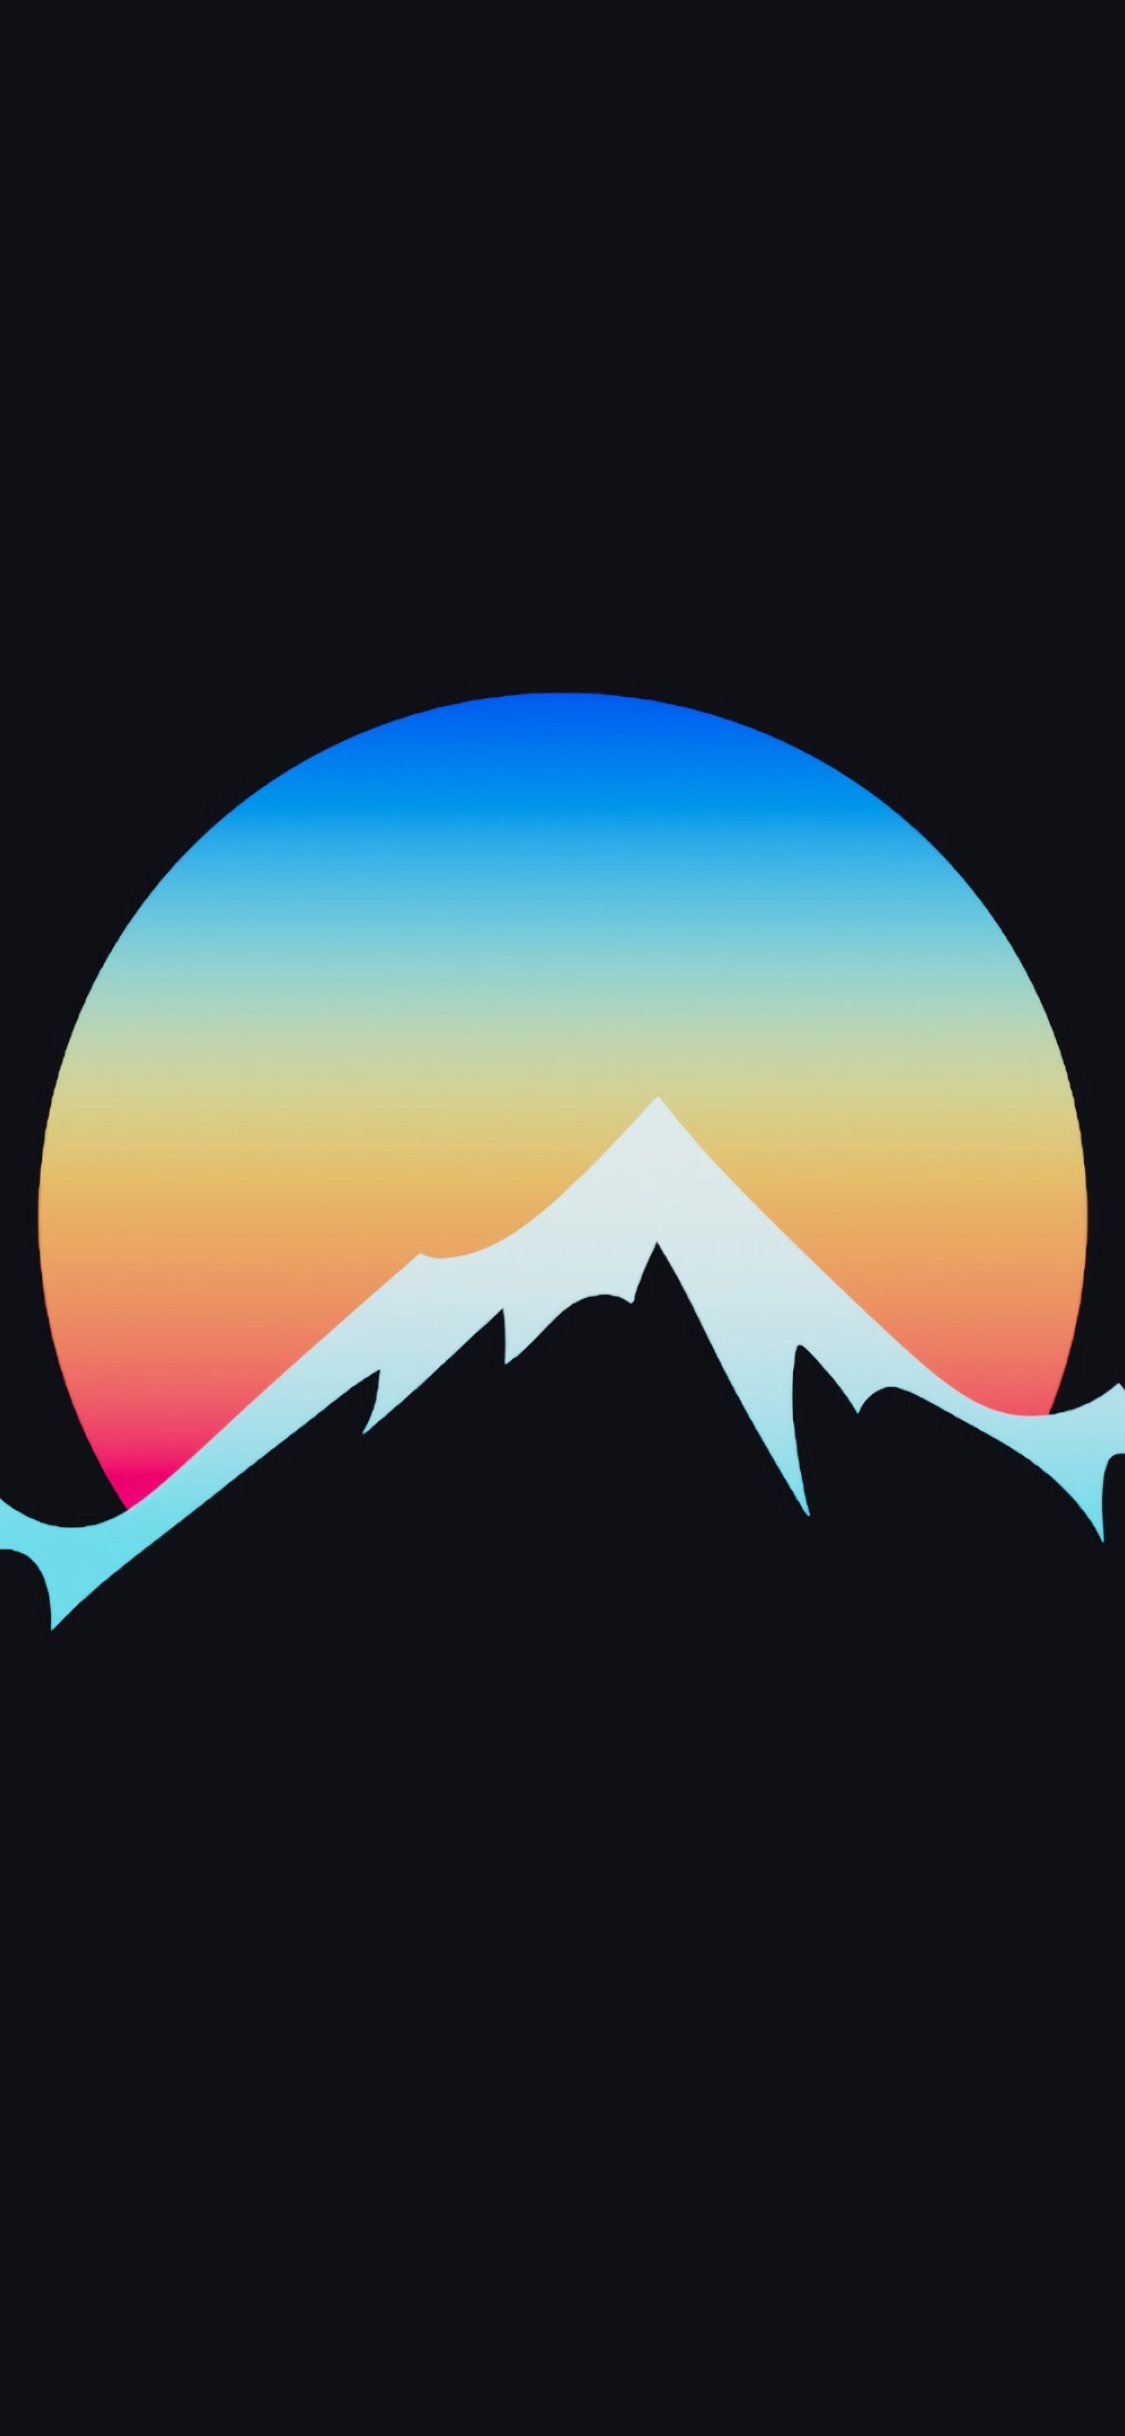 1125x2436 Minimalist Sunset In Hill Iphone Xsiphone 10